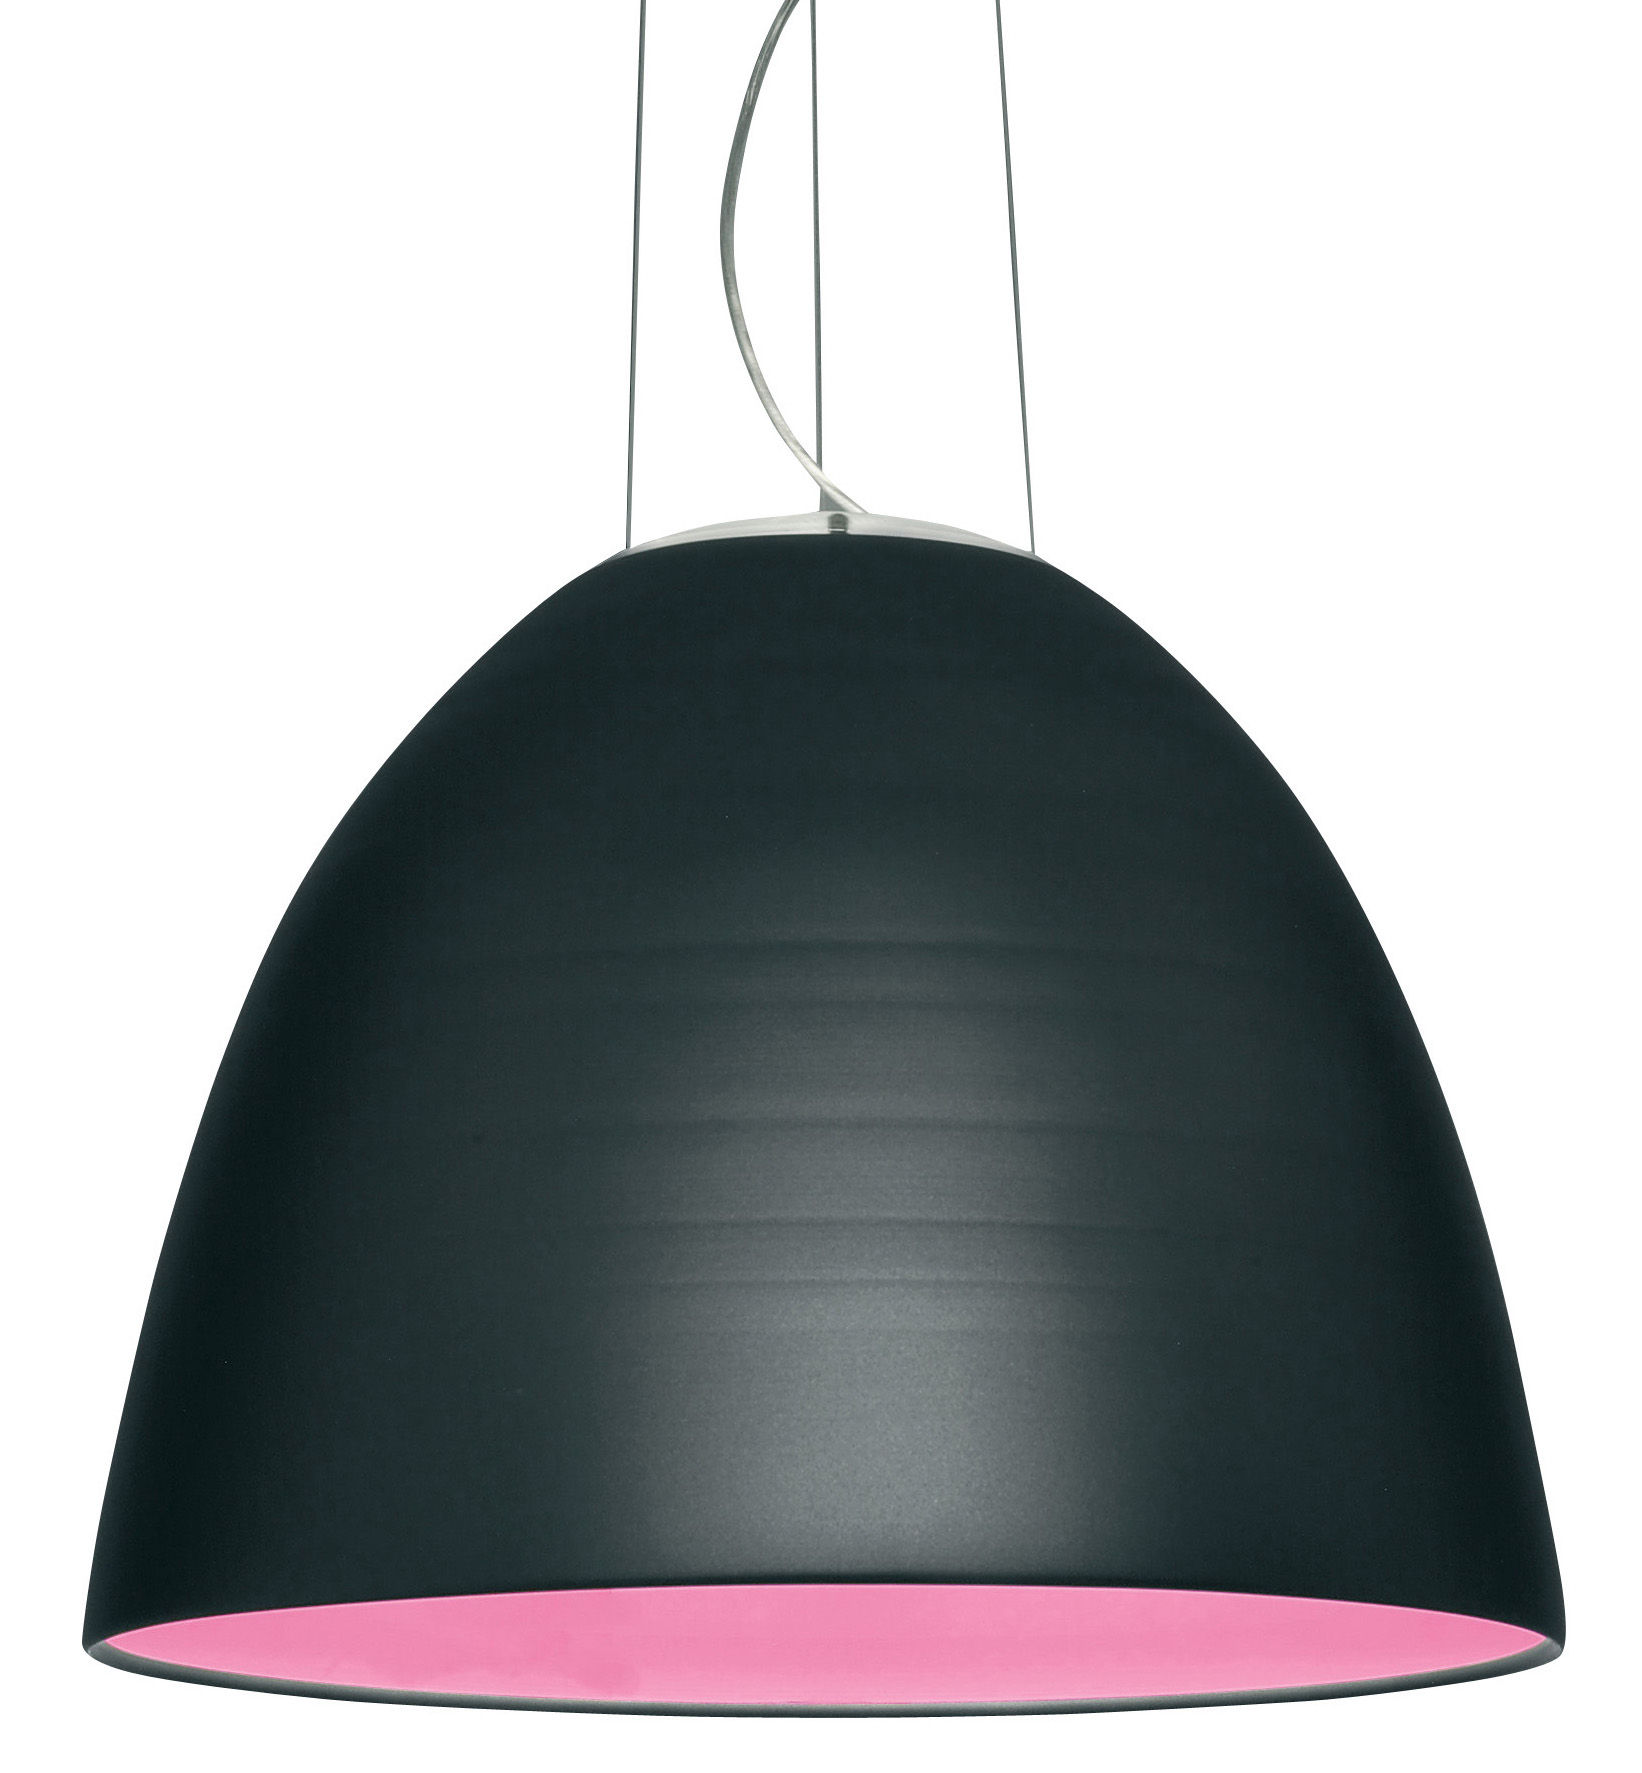 Lighting - Pendant Lighting - Nur Pendant by Artemide - Gray coat - Aluminium